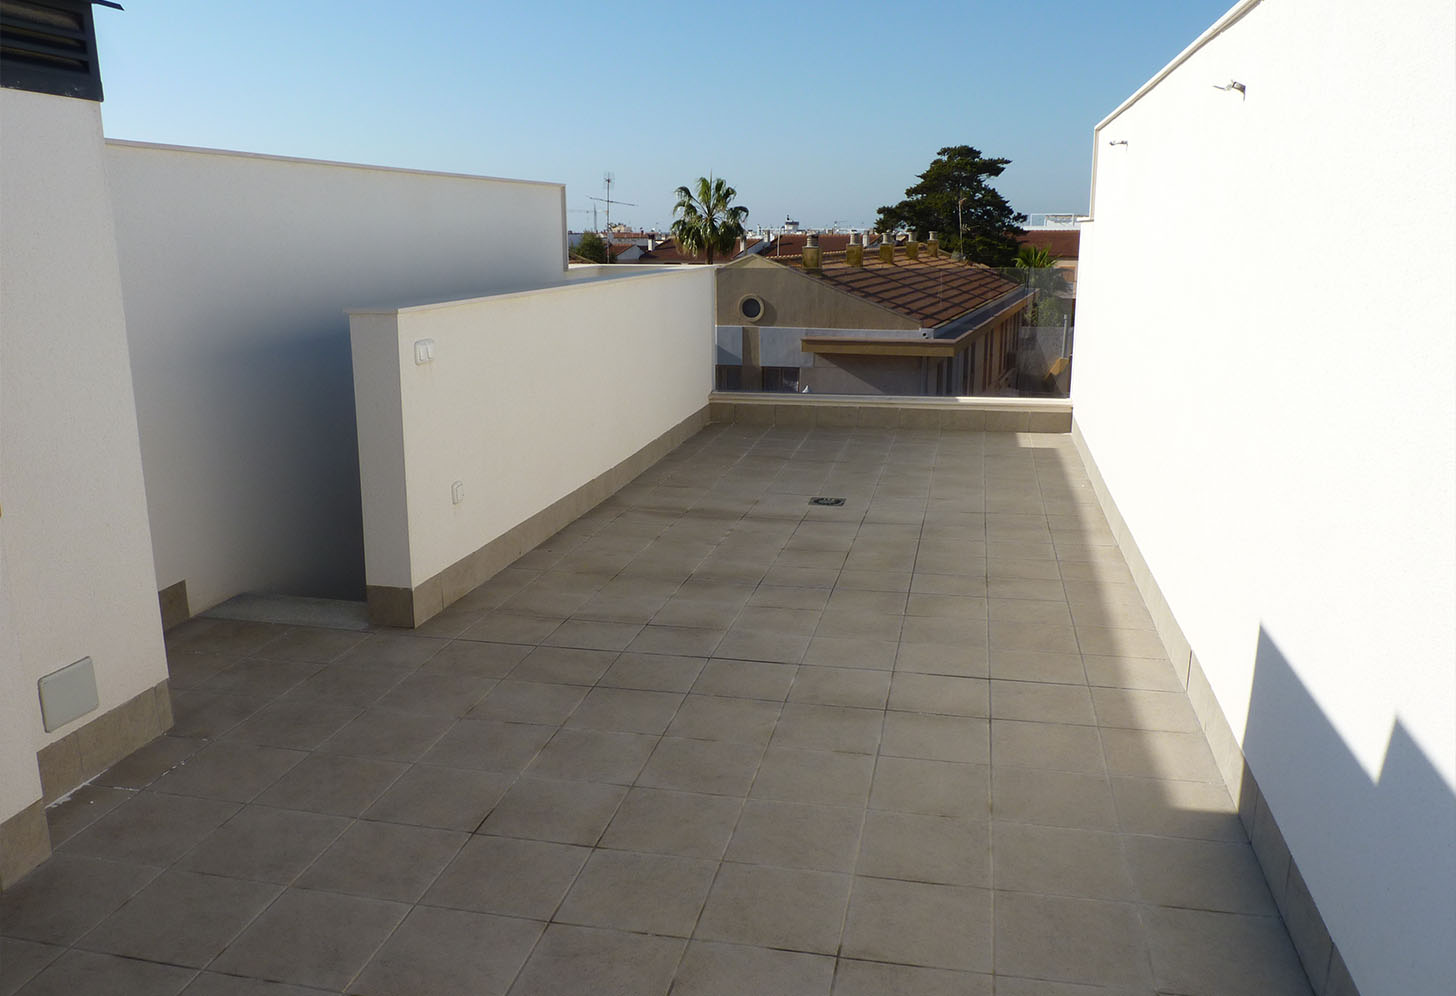 immobilier neuf espagne costa blanca on-n5 pinada margove solarium